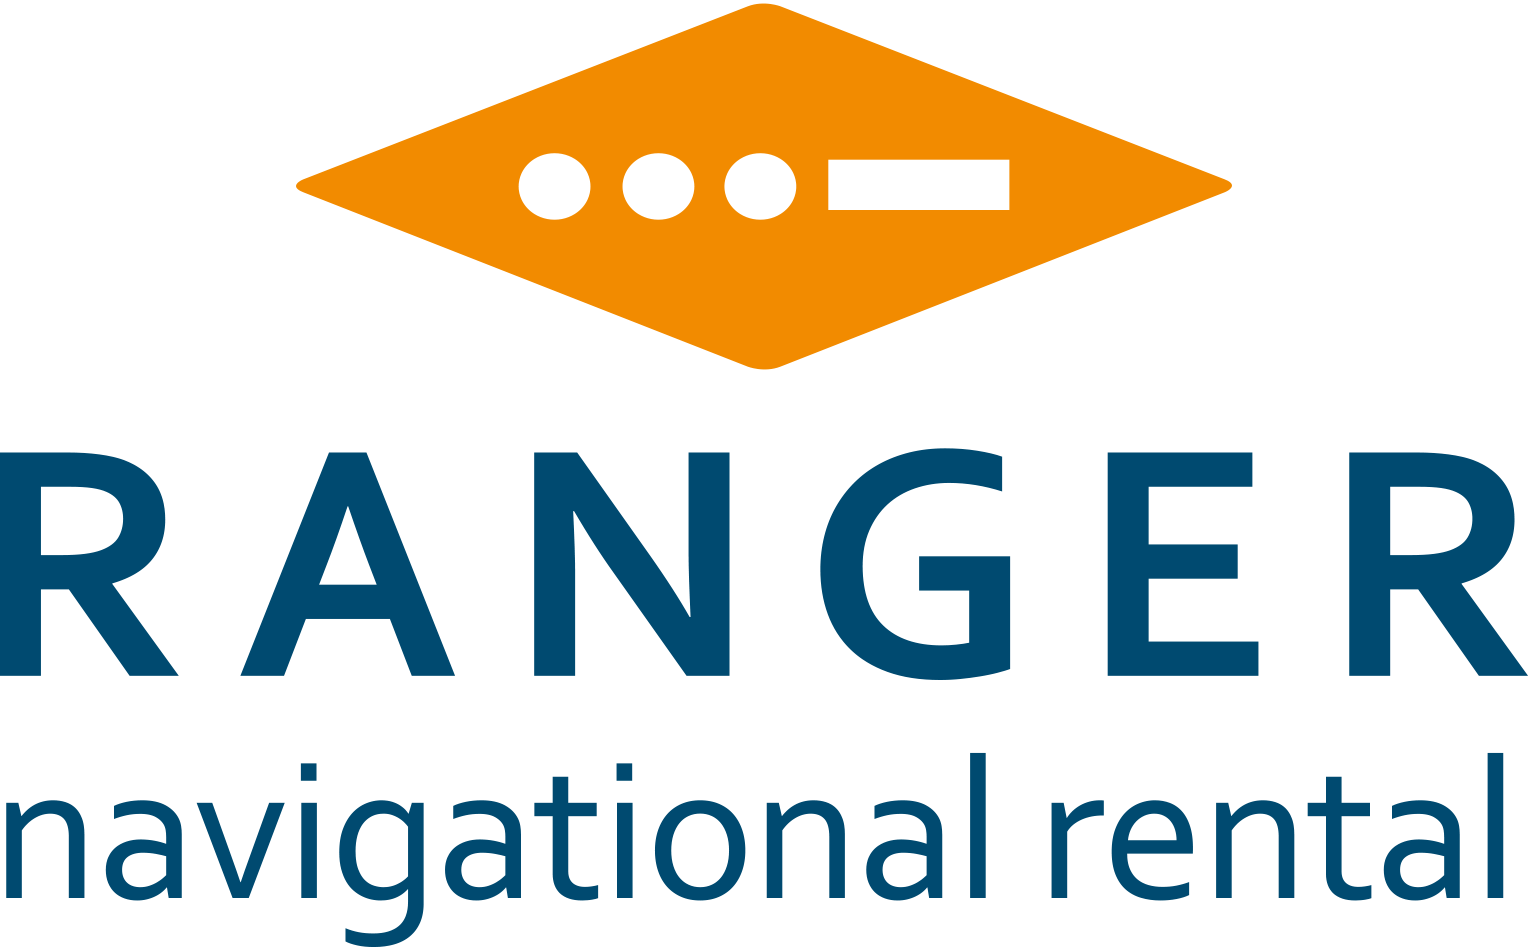 Ranger Navigational Rental